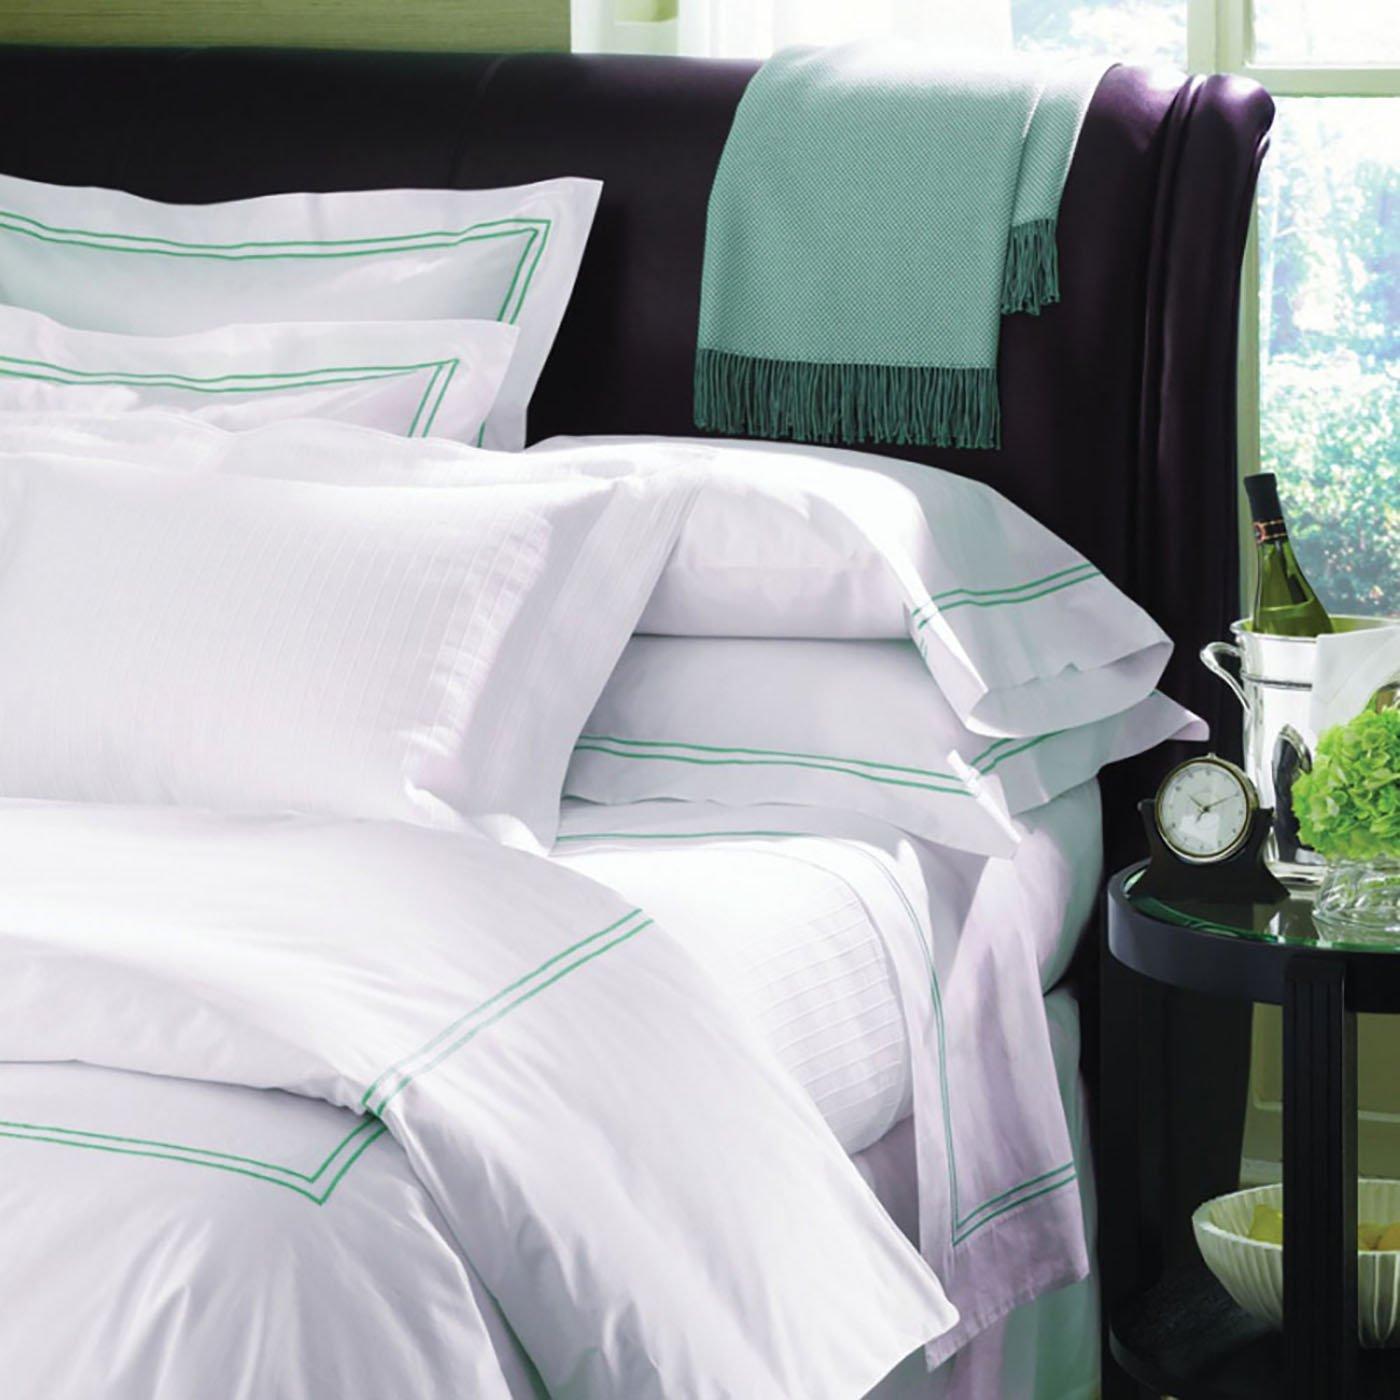 Grande Hotel by Sferra - King Flat Sheet 114x114 (White/White)